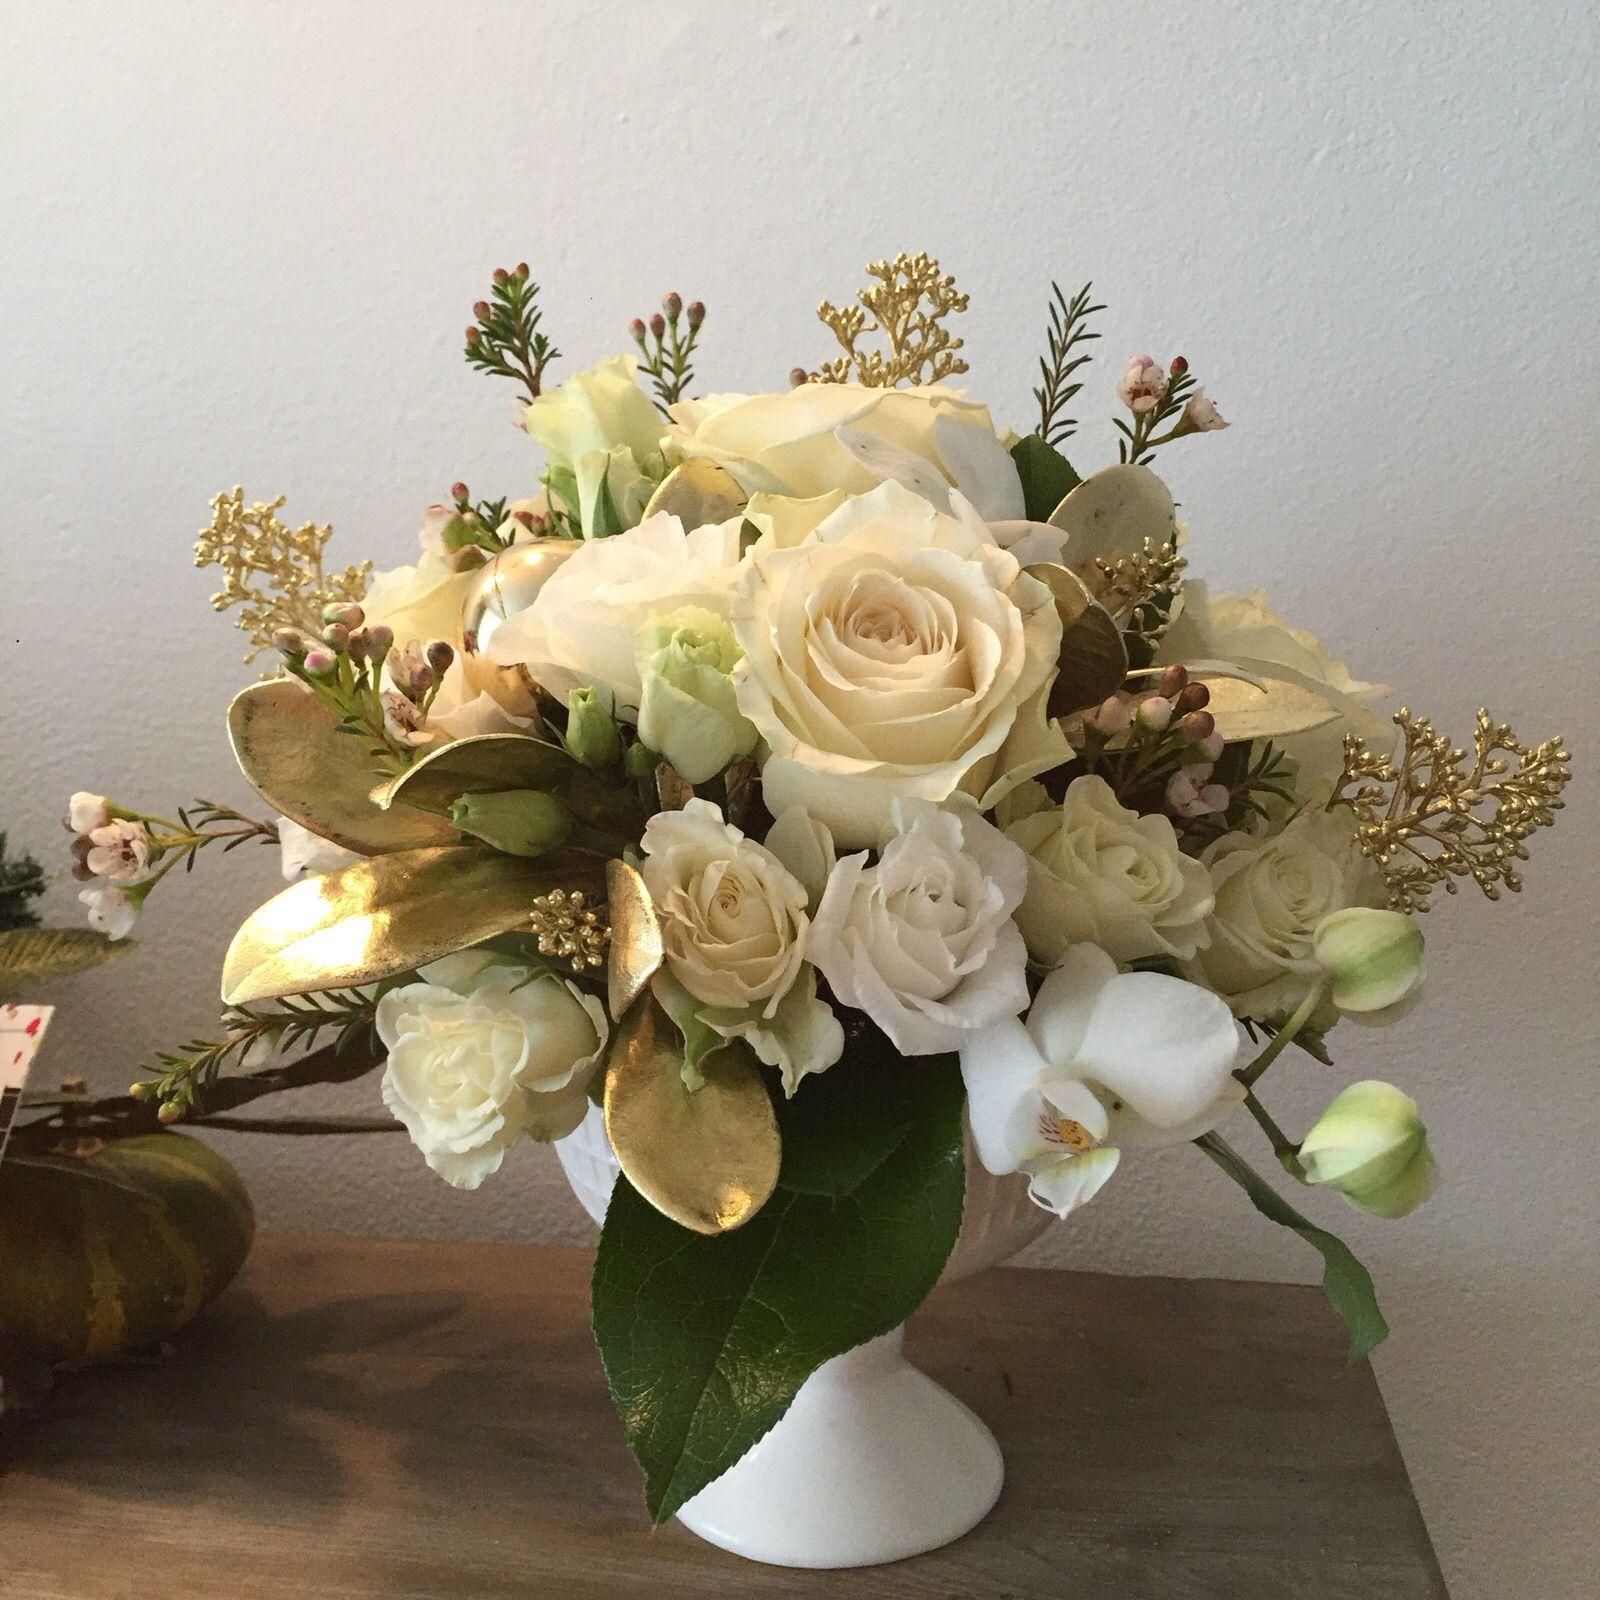 Aranjament Floral De Craciun White Christmas Enrose